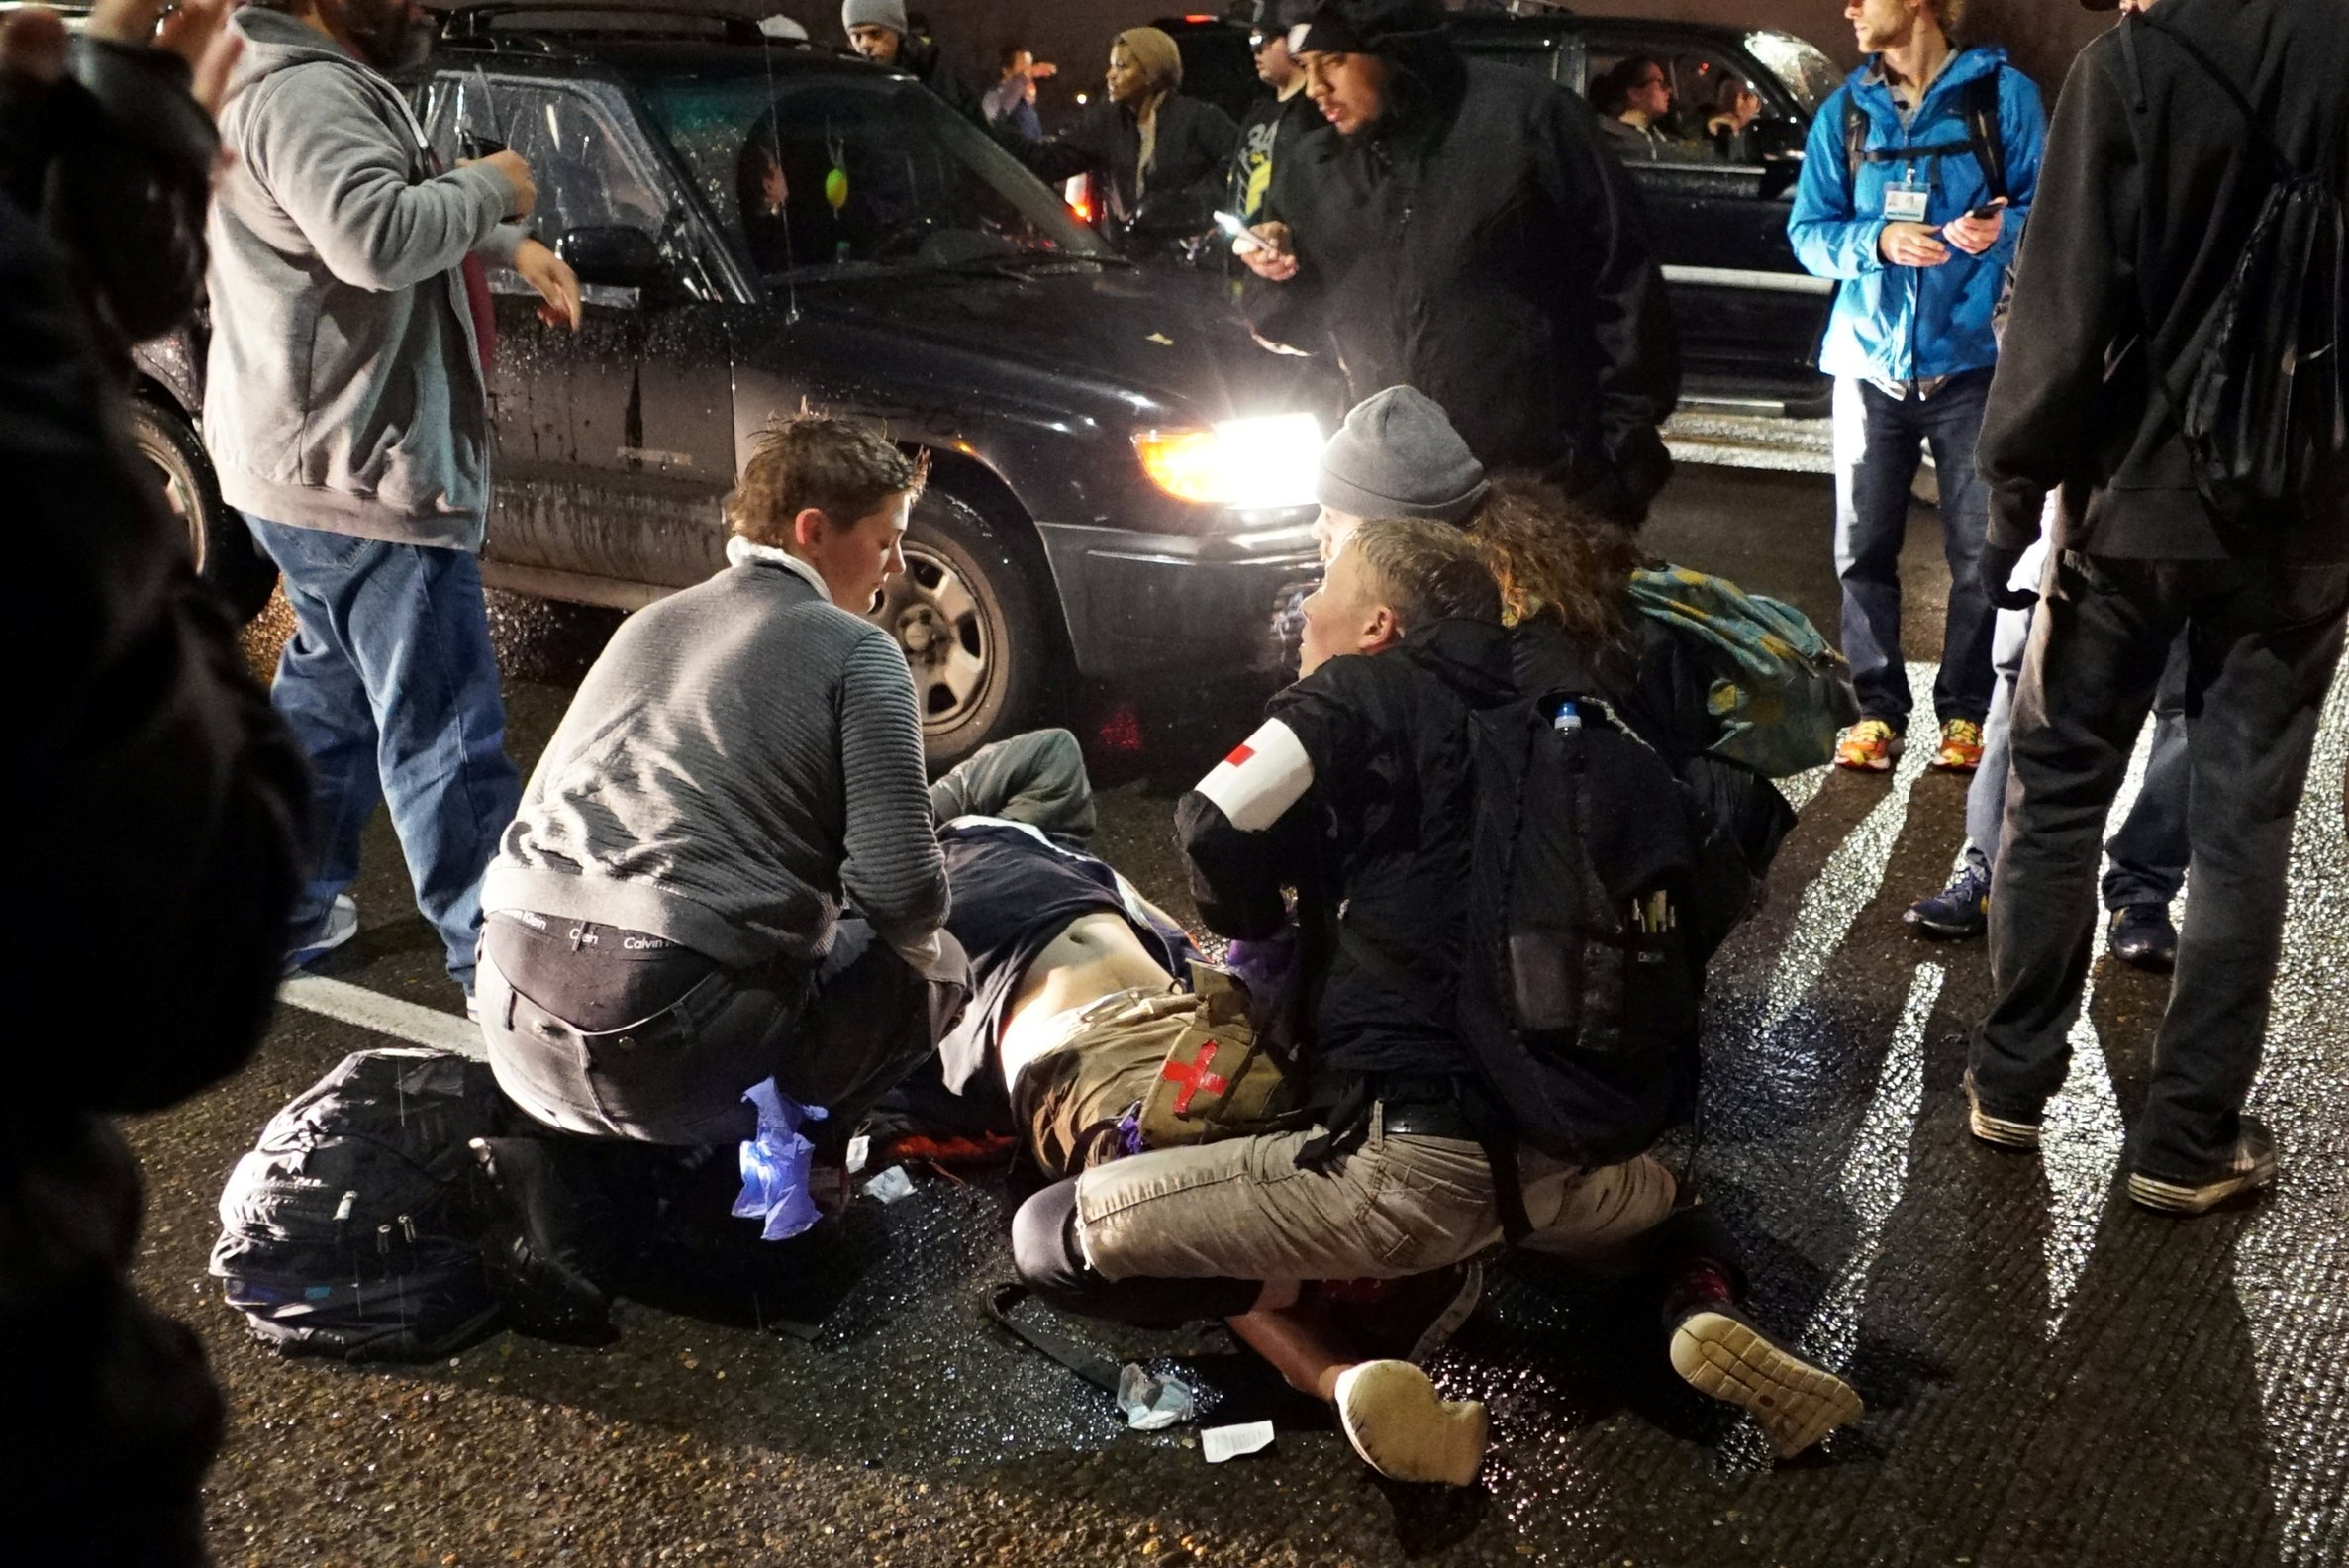 Man shot multiple times at anti-Trump rally